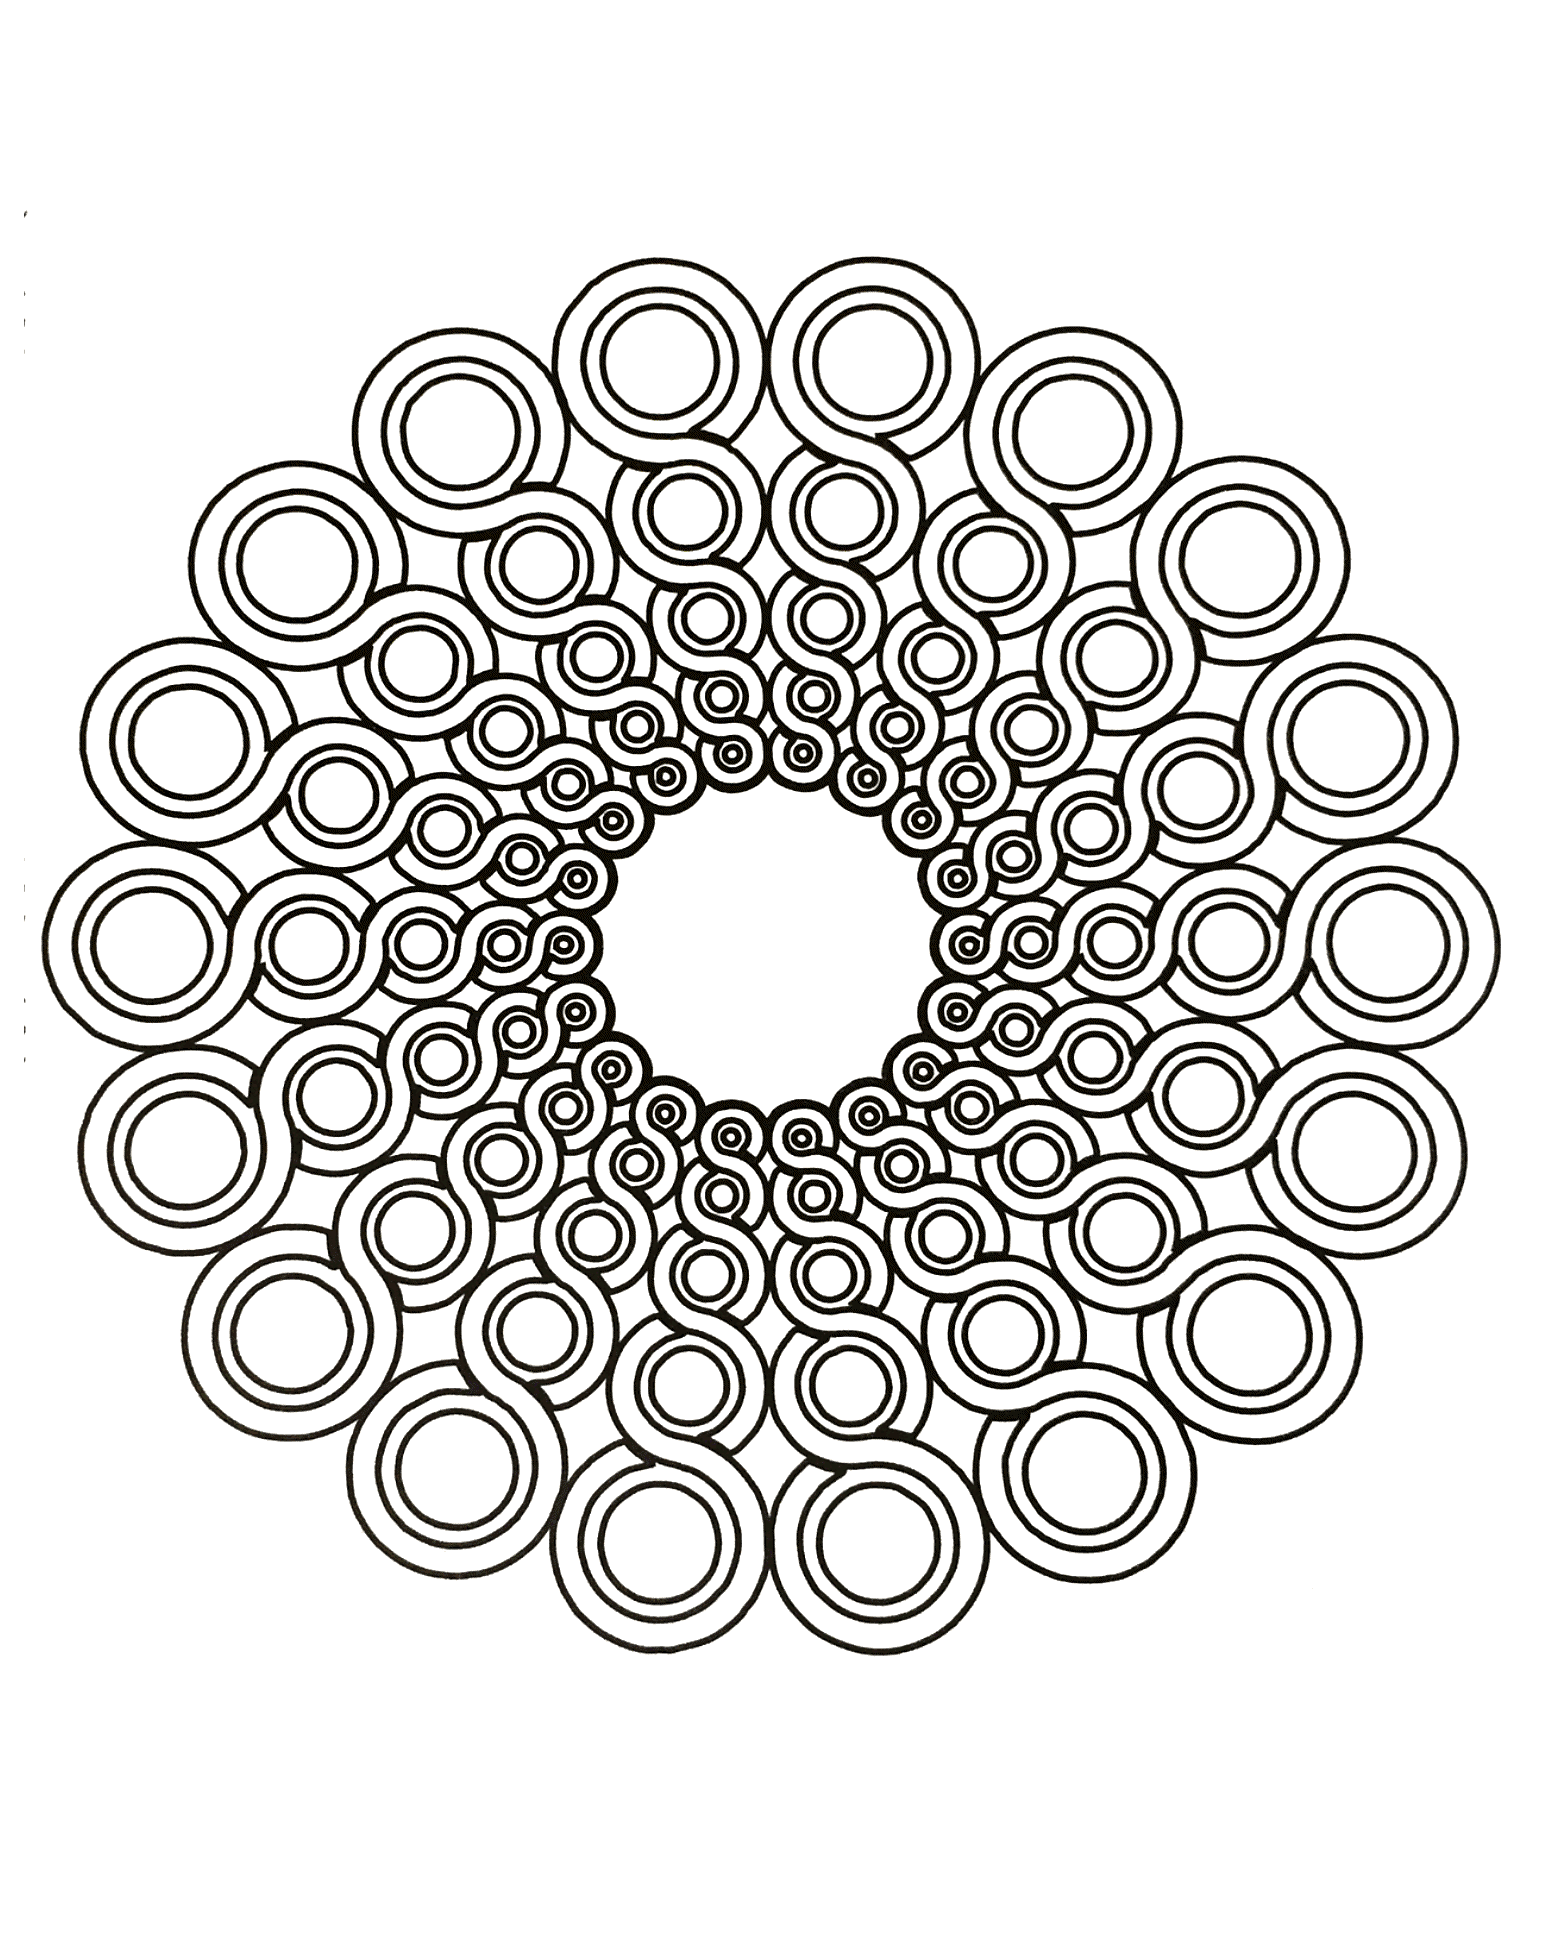 Mandala joaillerie mandalas zen anti stress 100 mandalas zen anti stress page 3 - Coloriage tractopelle a imprimer gratuit ...